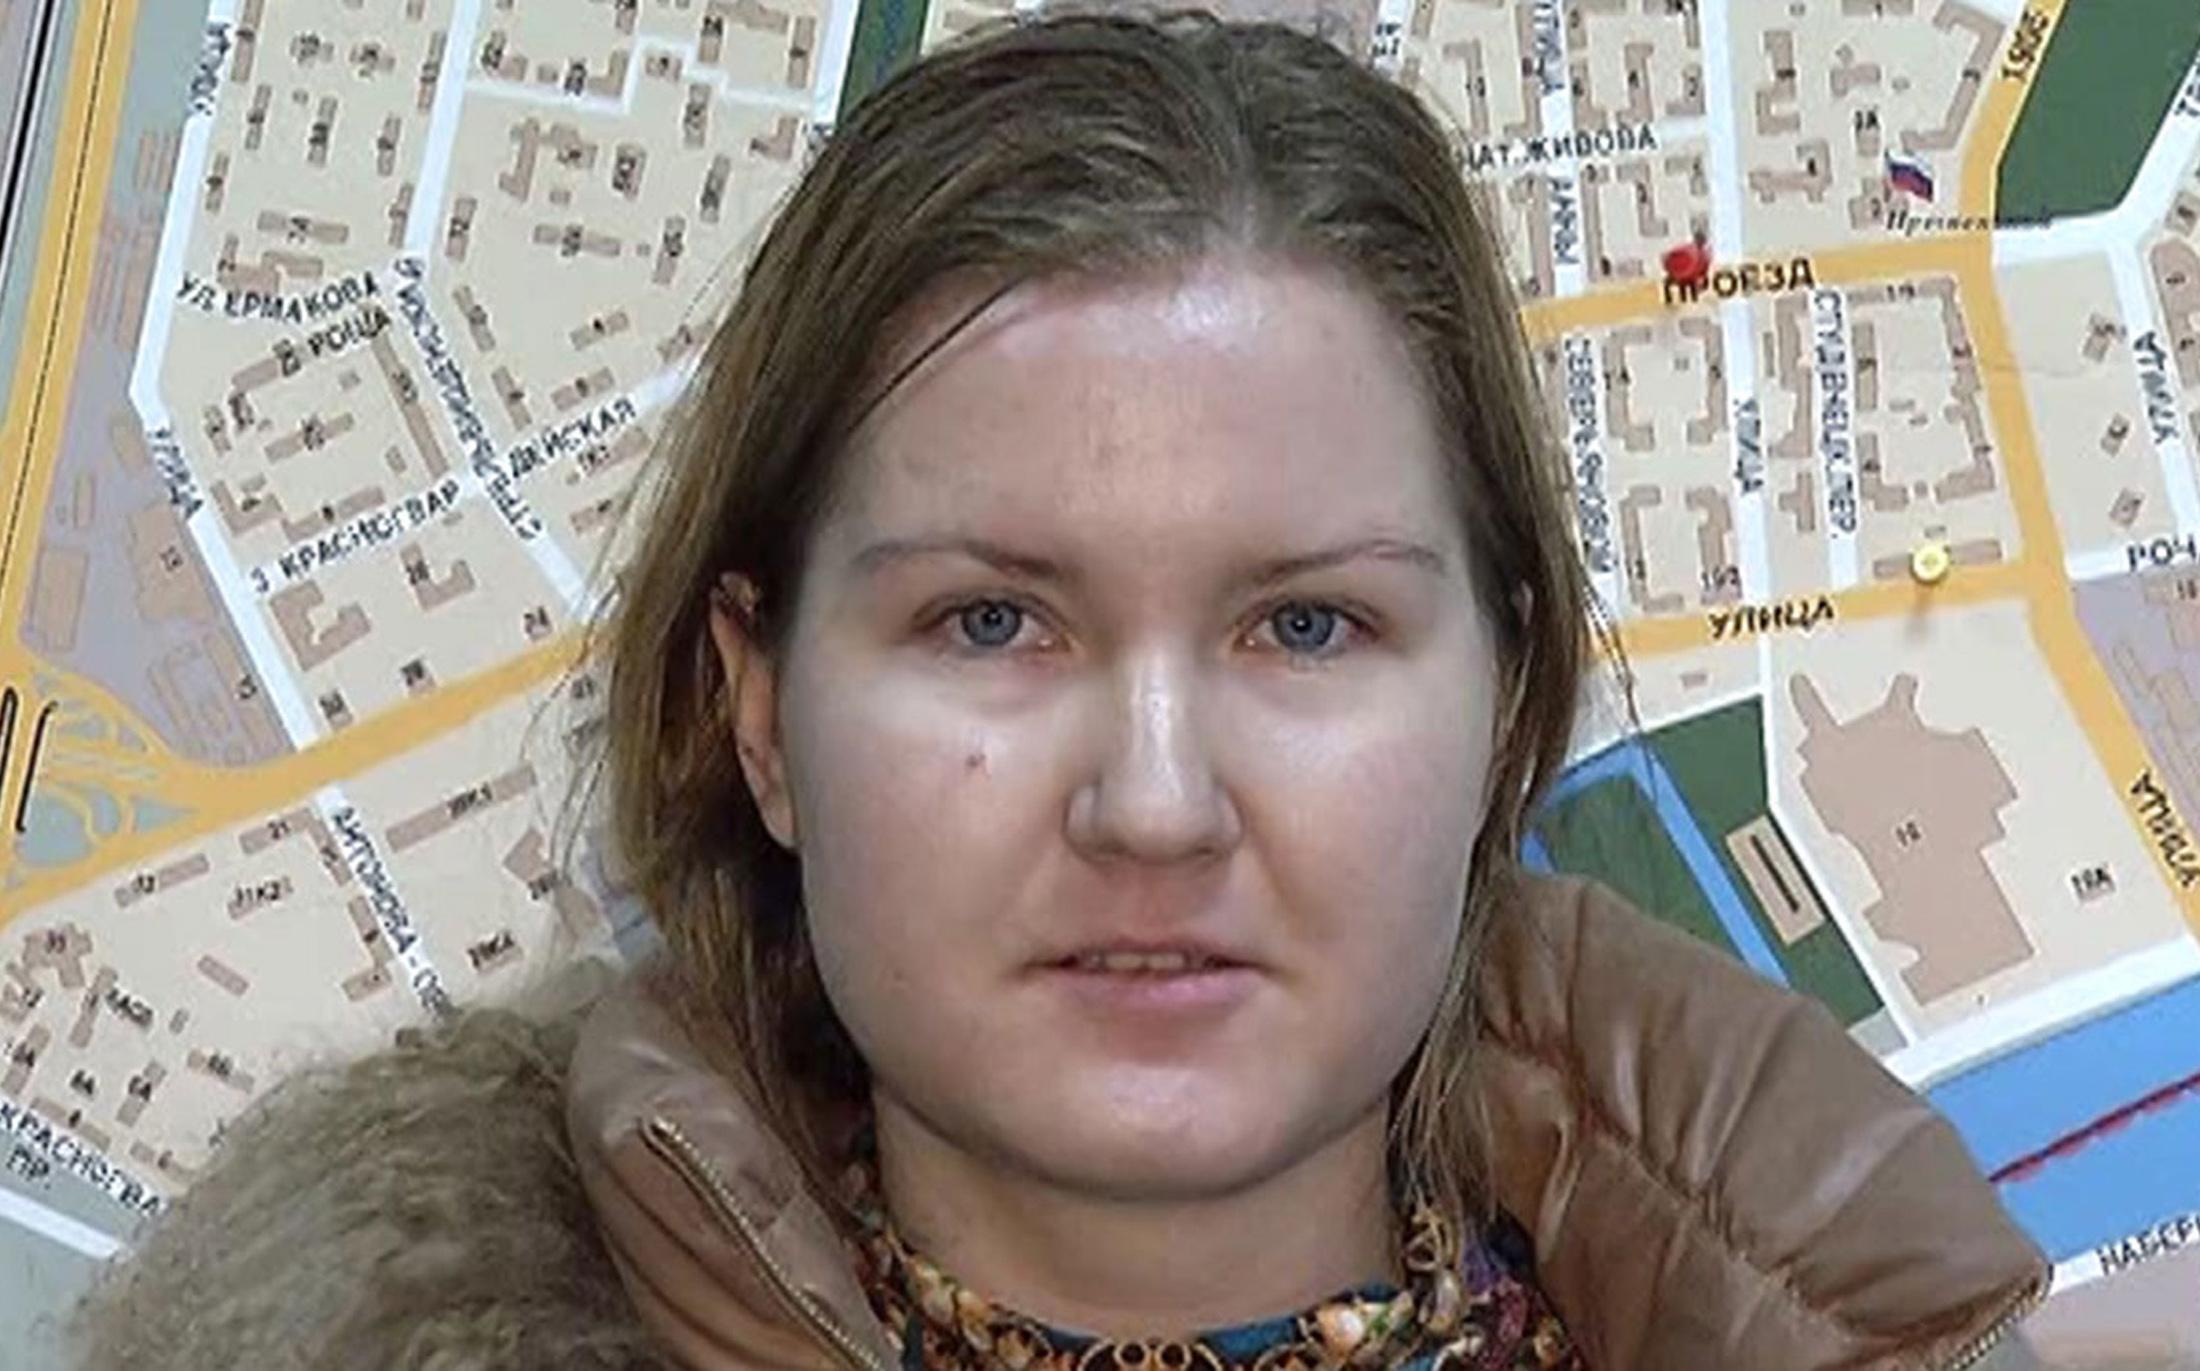 Девушка, подозреваемая в нападении на Олега Шеина. <br> Фотография: Пресс-служба ГУ МВД РФ